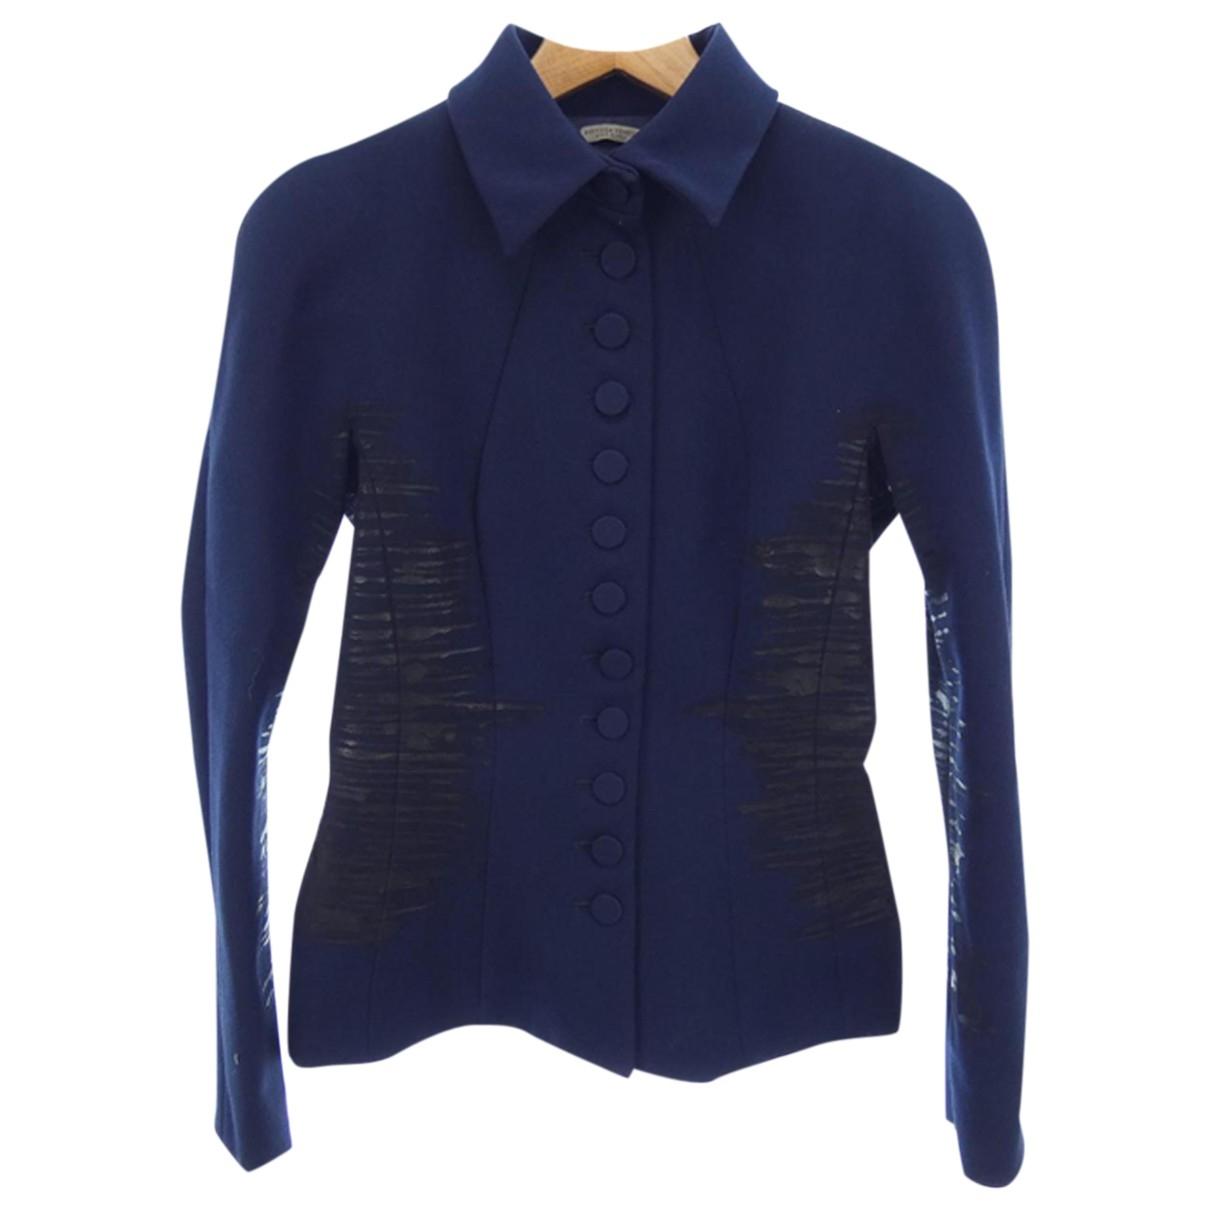 Bottega Veneta - Veste   pour femme en laine - bleu